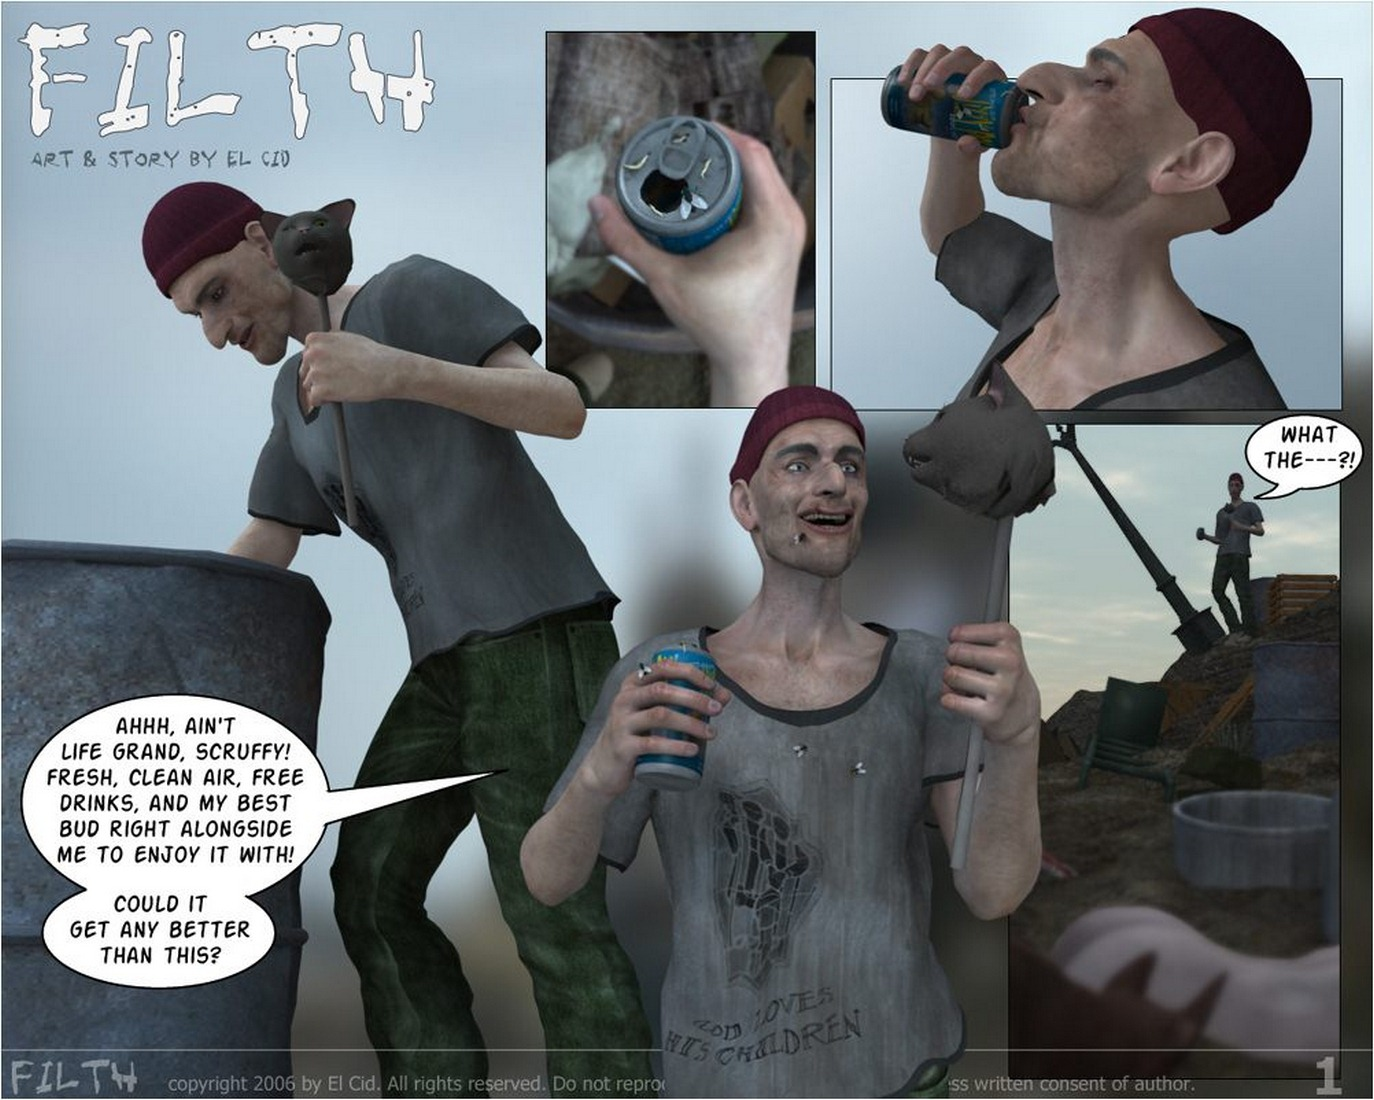 Filth image 01